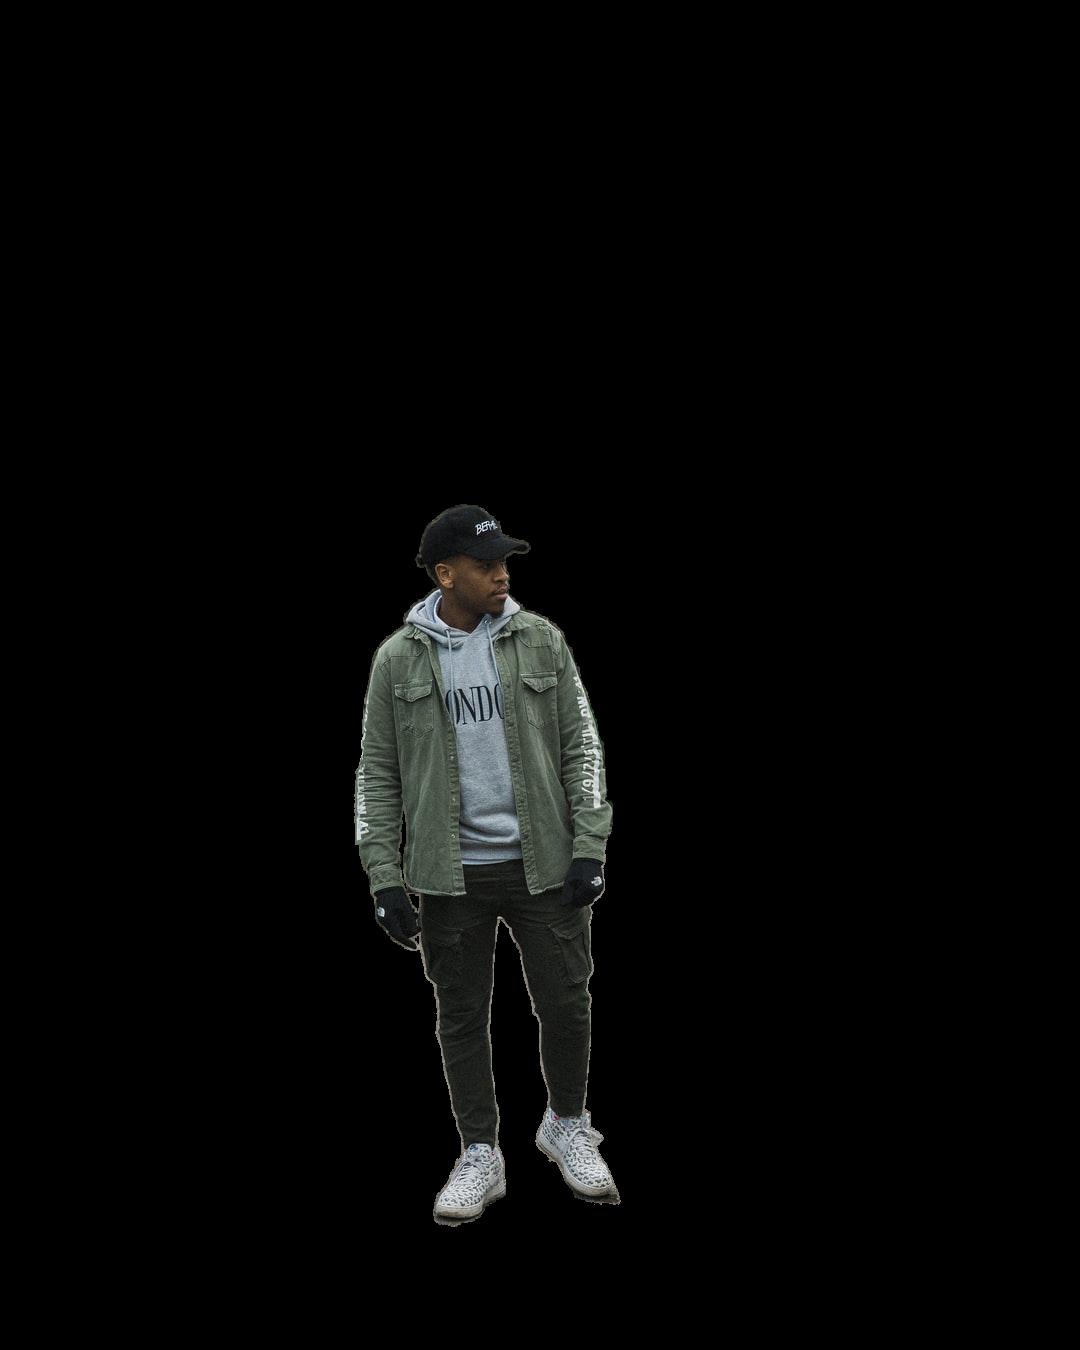 man in gray jacket standing on bridge